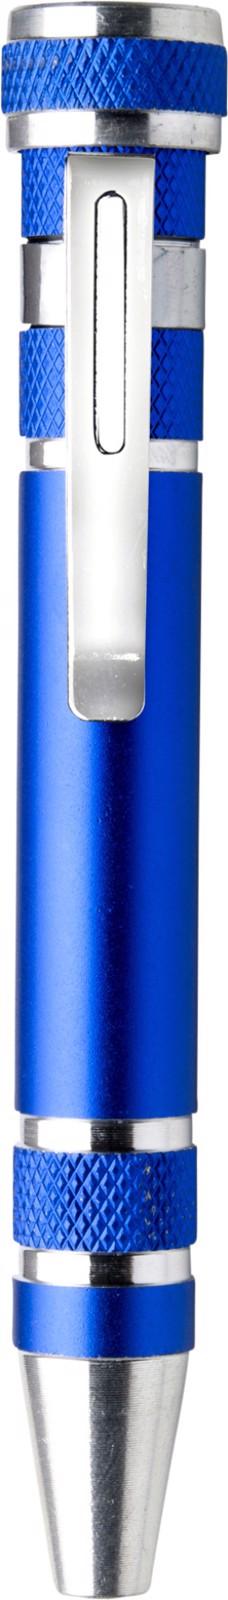 Aluminium pocket screwdriver - Cobalt Blue